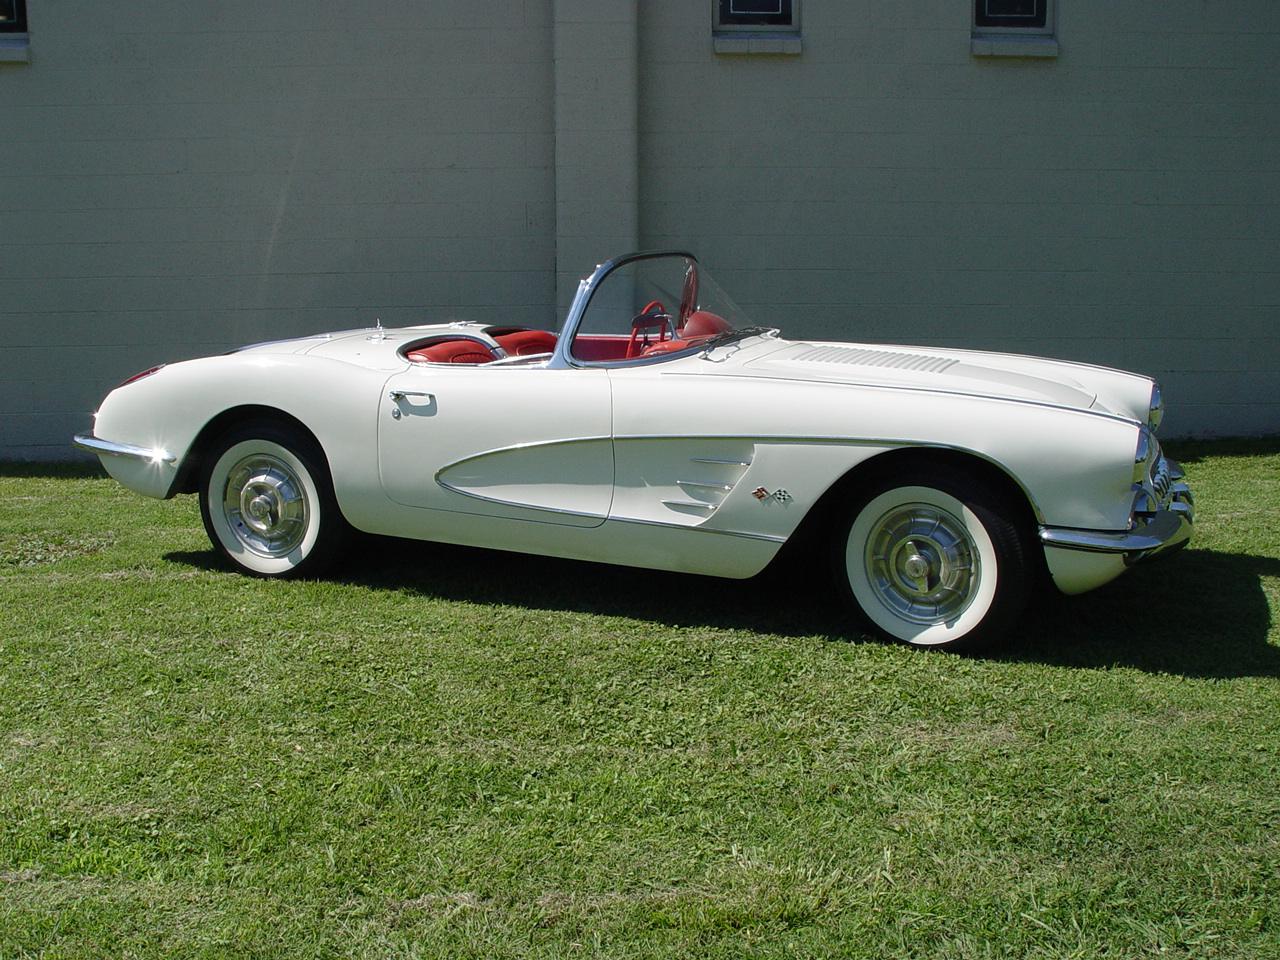 1958 corvette unrestored sinor prestige automobiles inc 1958 chevrolet corvette j58s104484. Black Bedroom Furniture Sets. Home Design Ideas